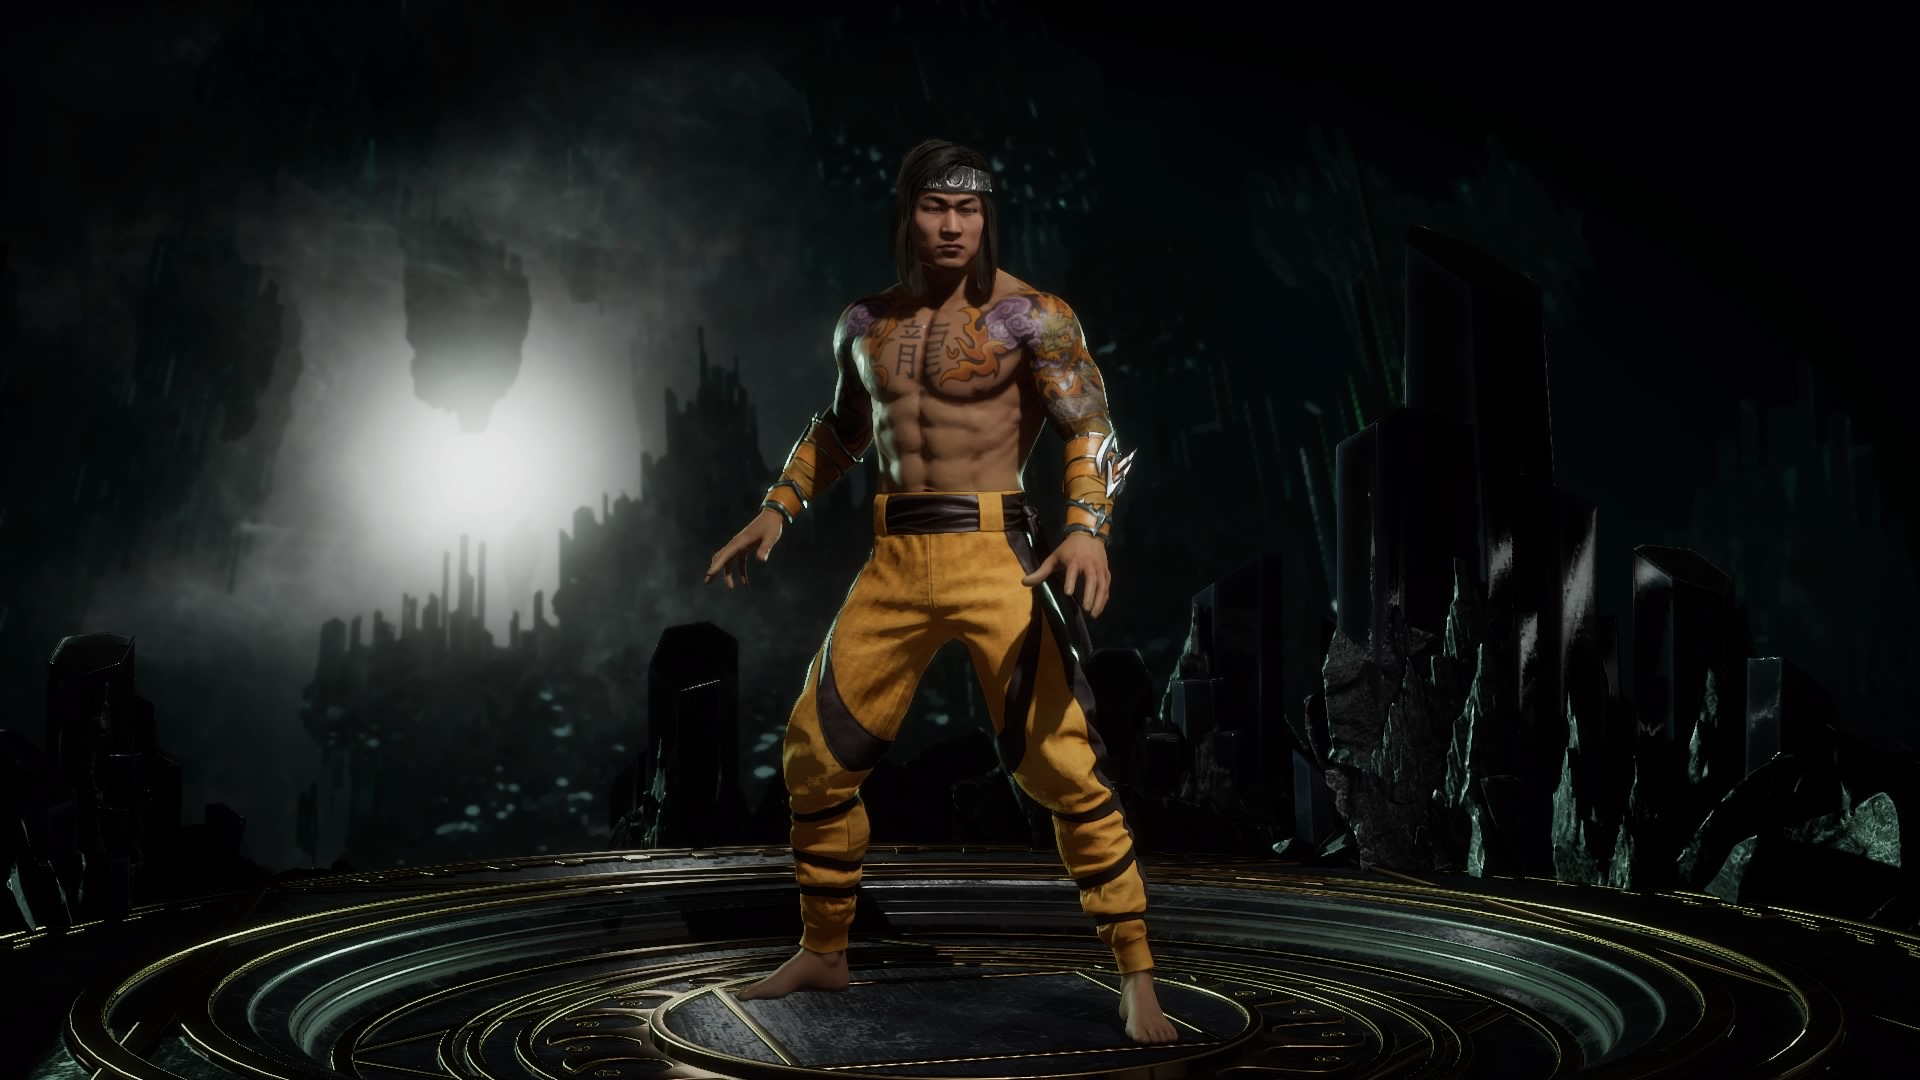 Mortal Kombat 9 Liu Kang Wallpaper Posted By Ethan Peltier